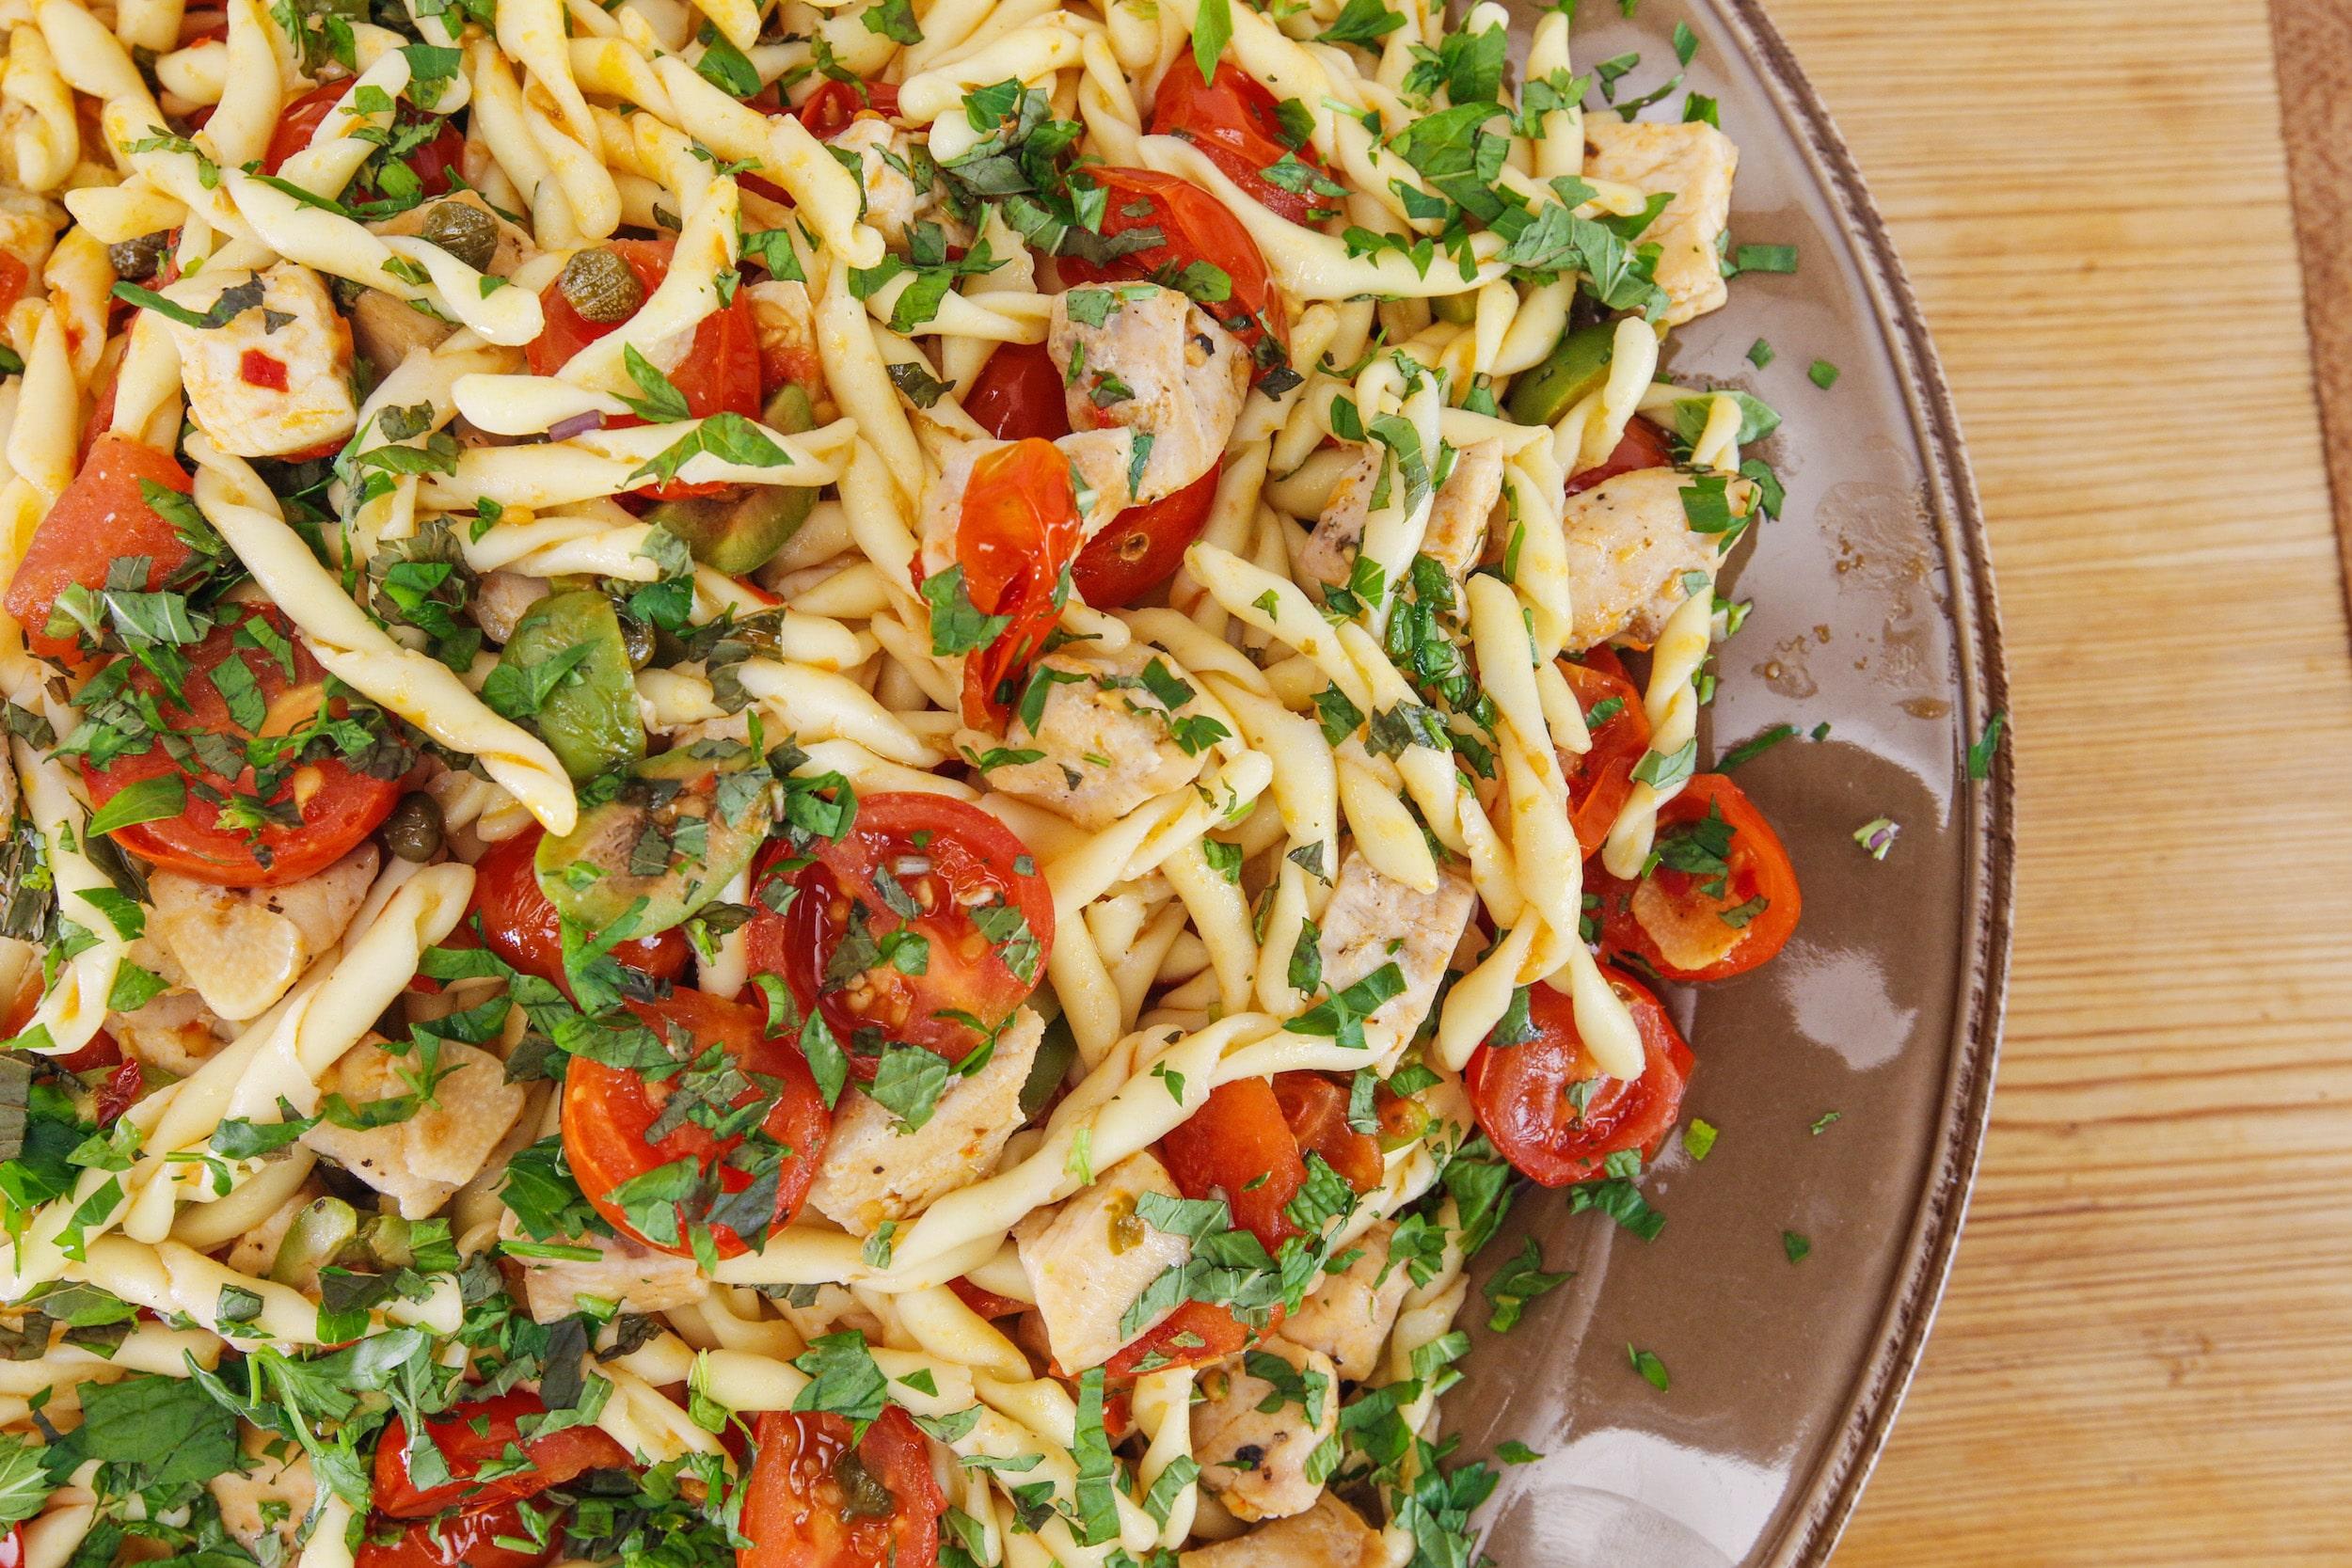 Rachael's Swordfish Pasta with Fresh Tomatoes